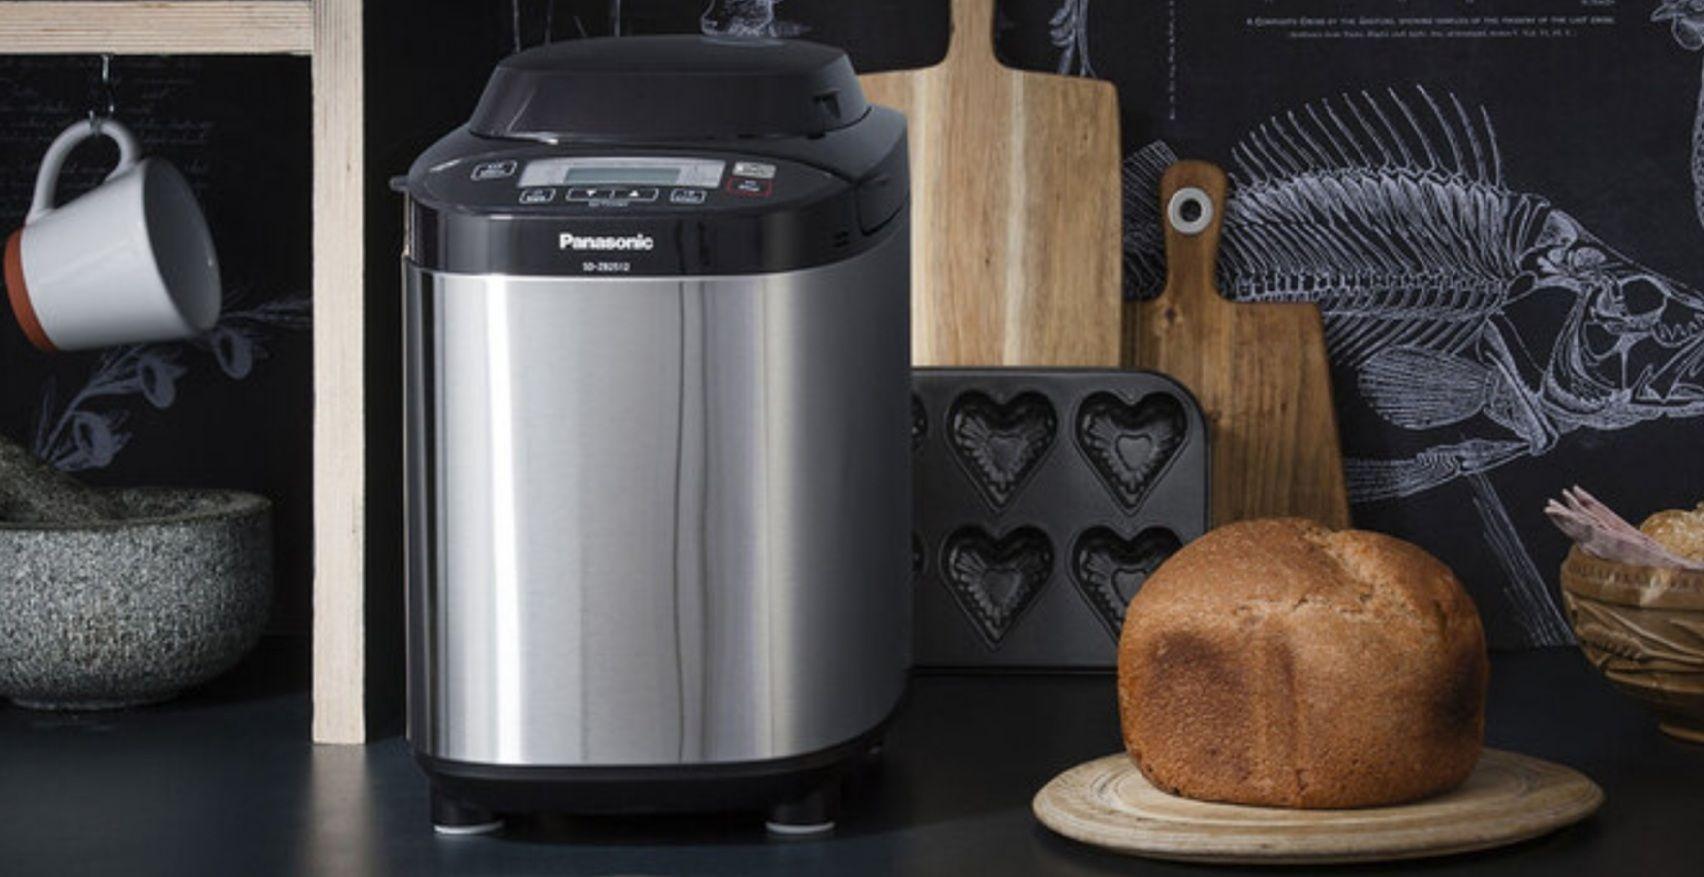 Panasonic Bread Maker SD-ZB2512KXC - £159.99 @ Costco